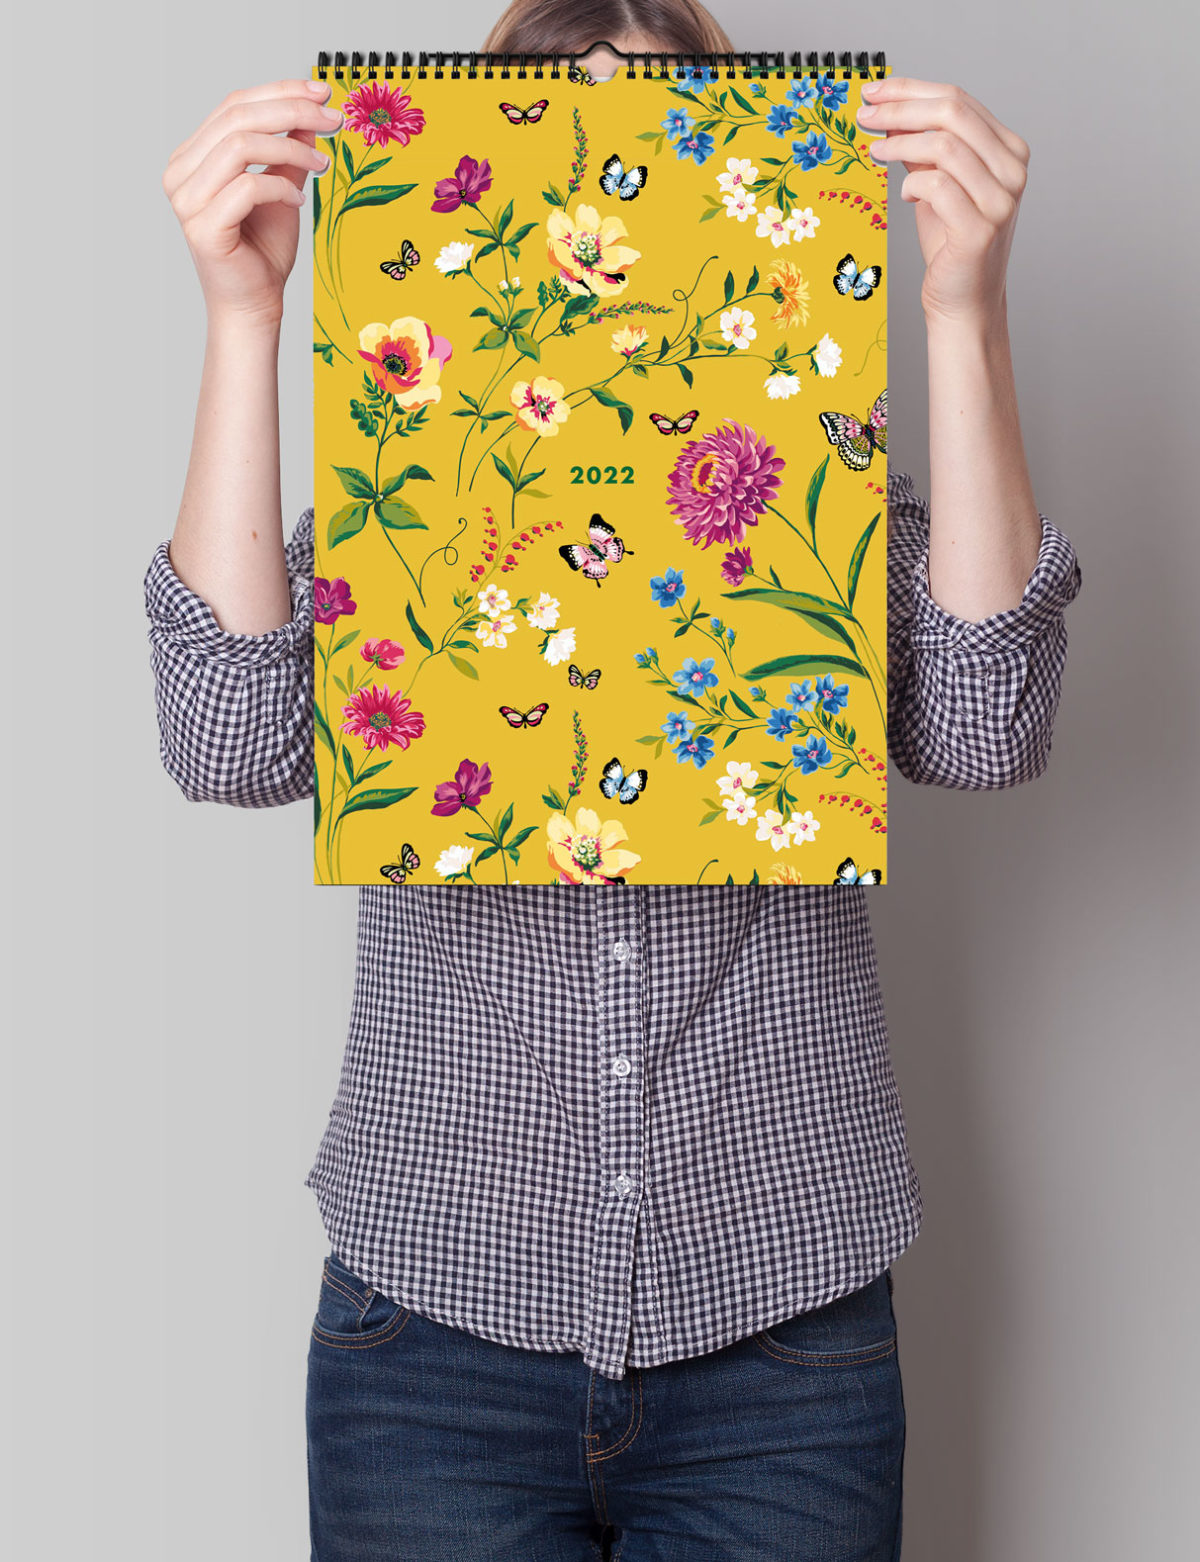 Floral 2022 Family Wall Calendar